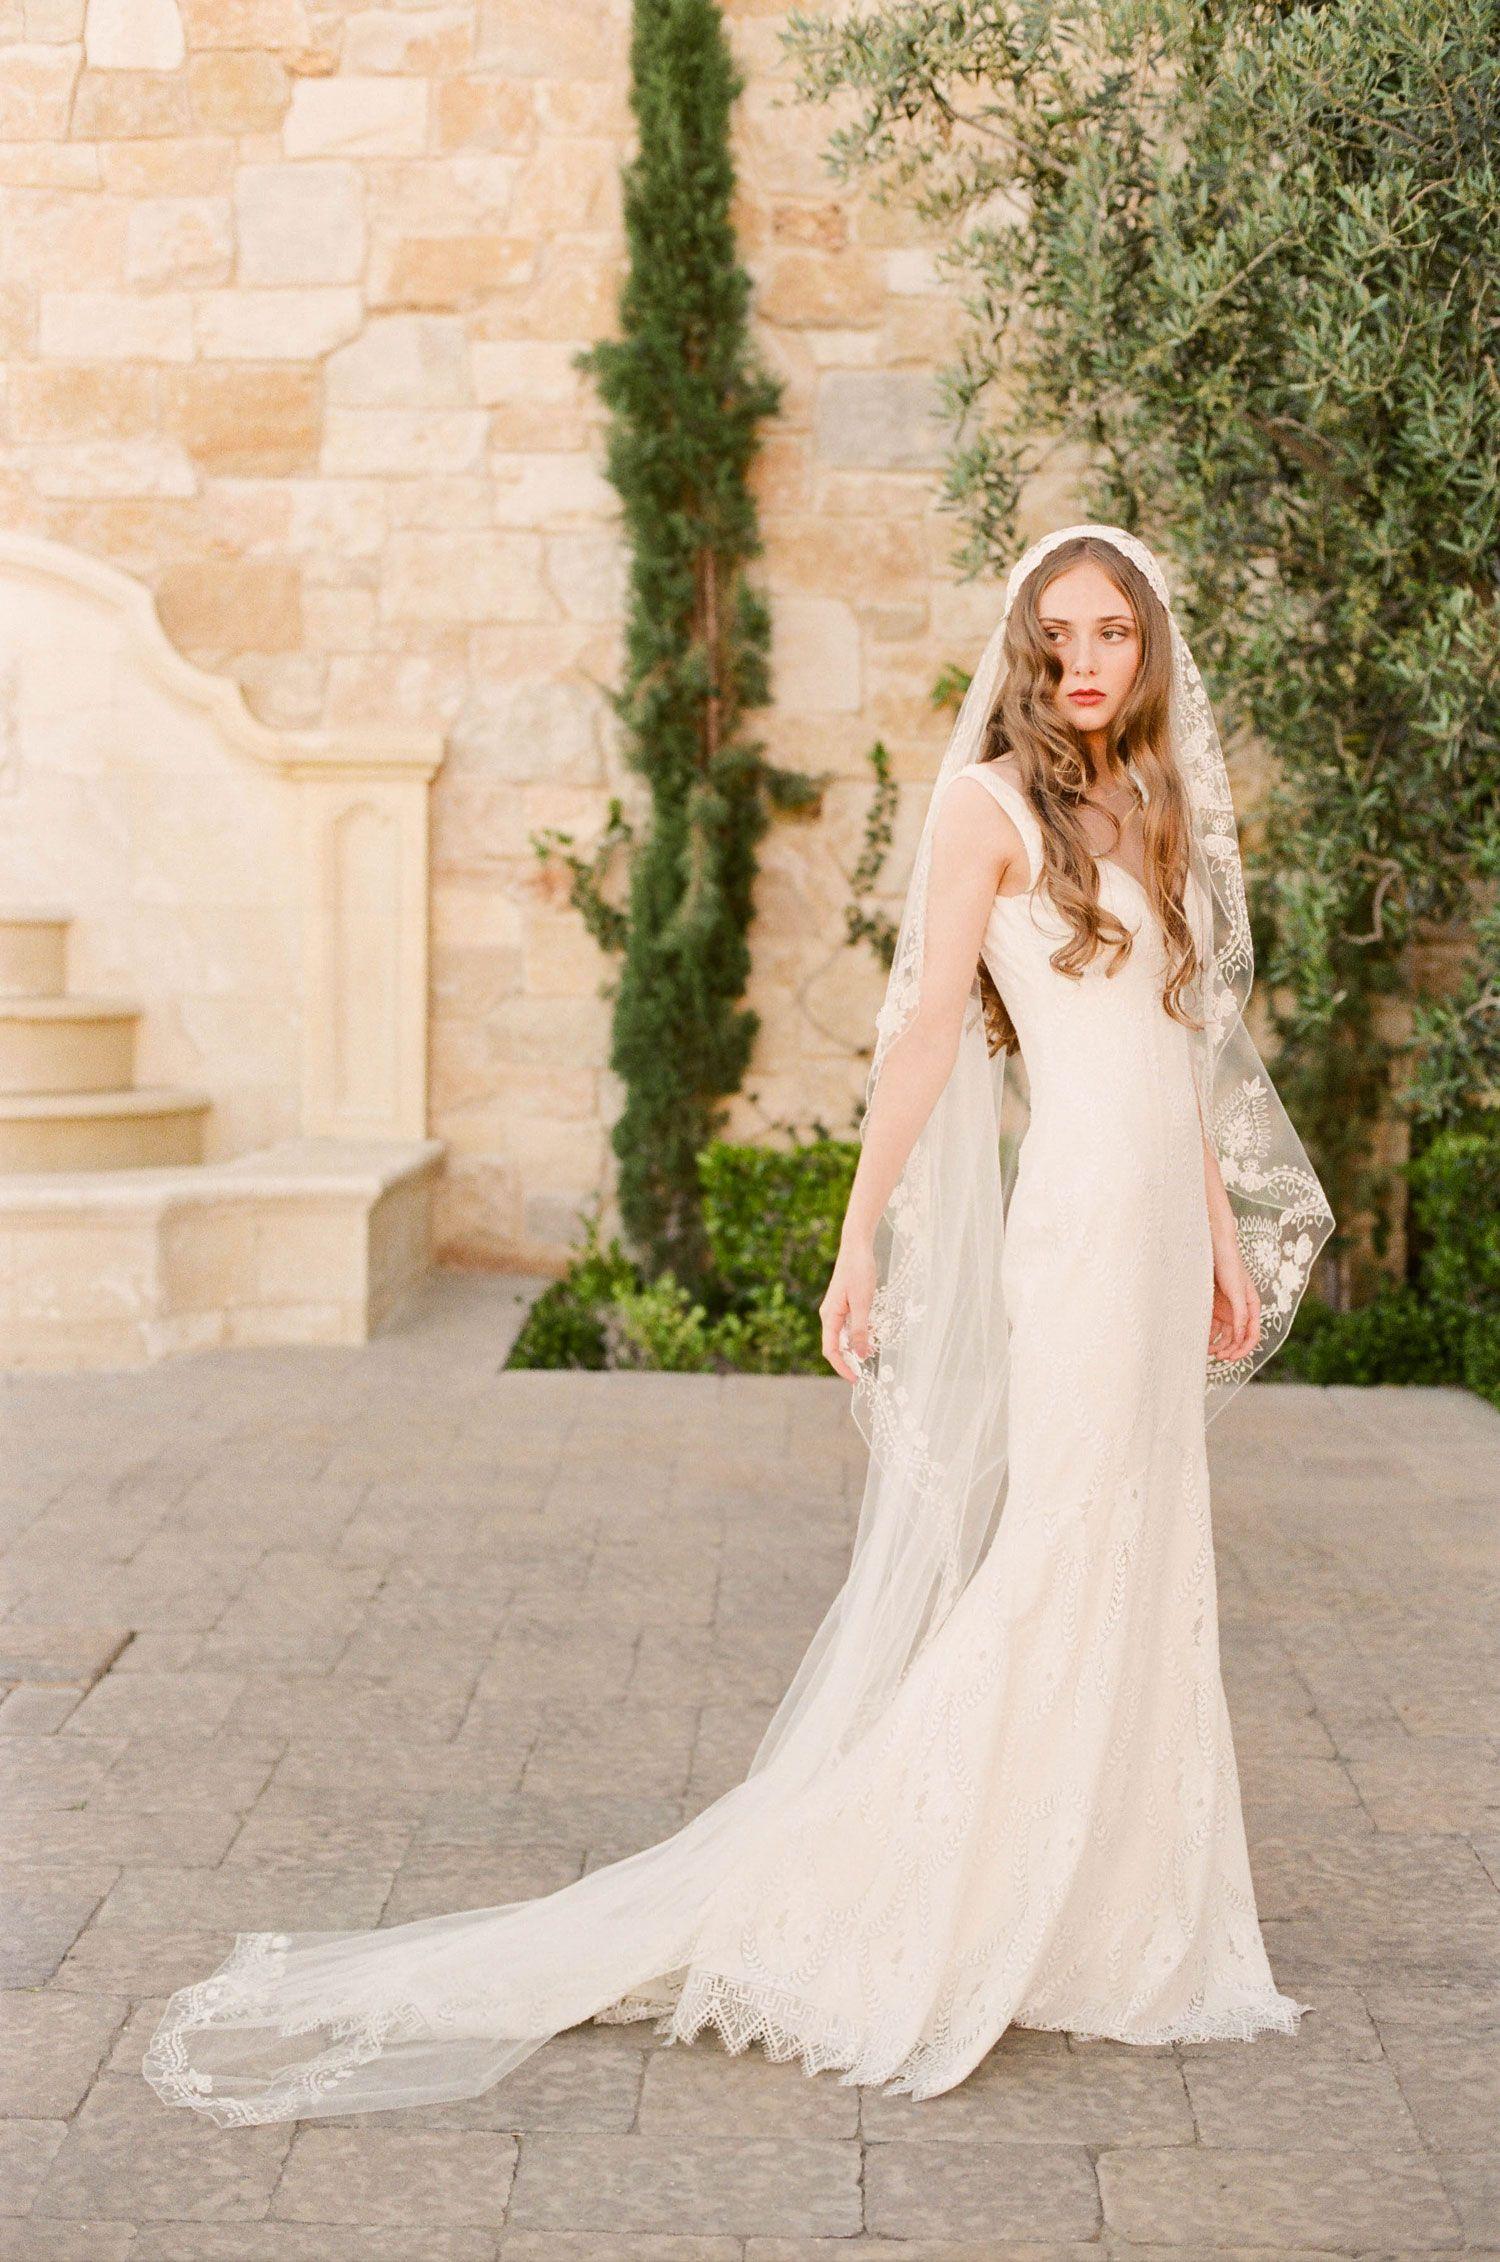 Claire Pettibone Romantique 2018 The Vineyard Collection Toscana Sheath Lace Trim Wedding Dress And Veil